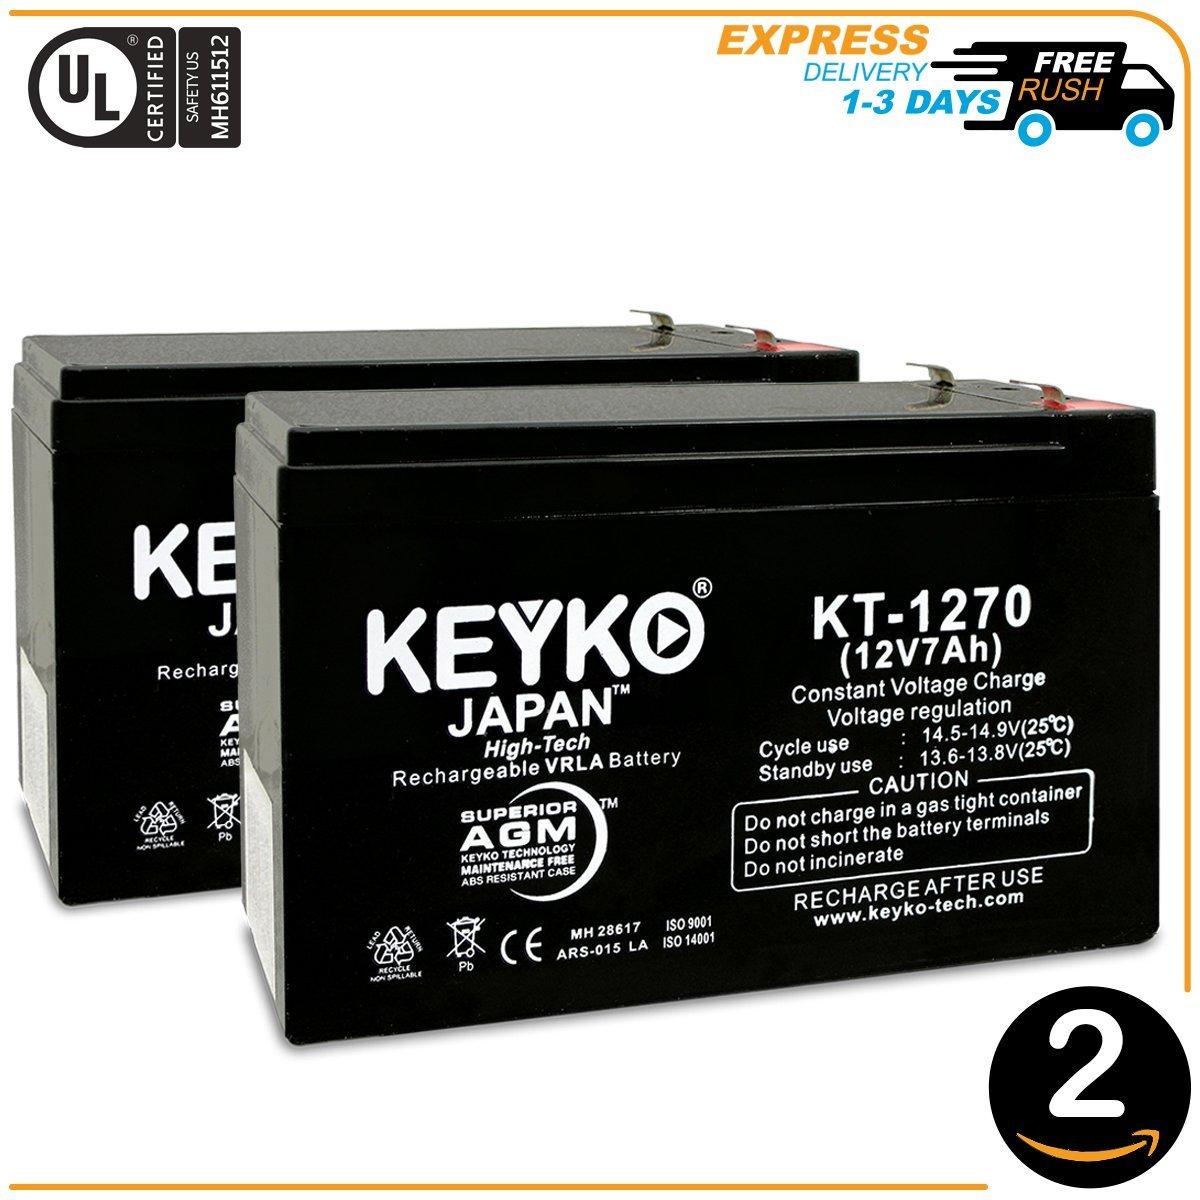 W//F-1 Terminal 12V 7.5 Sealed Lead Acid SLA Battery Genuine POWERSTAR Replaces KT-1270